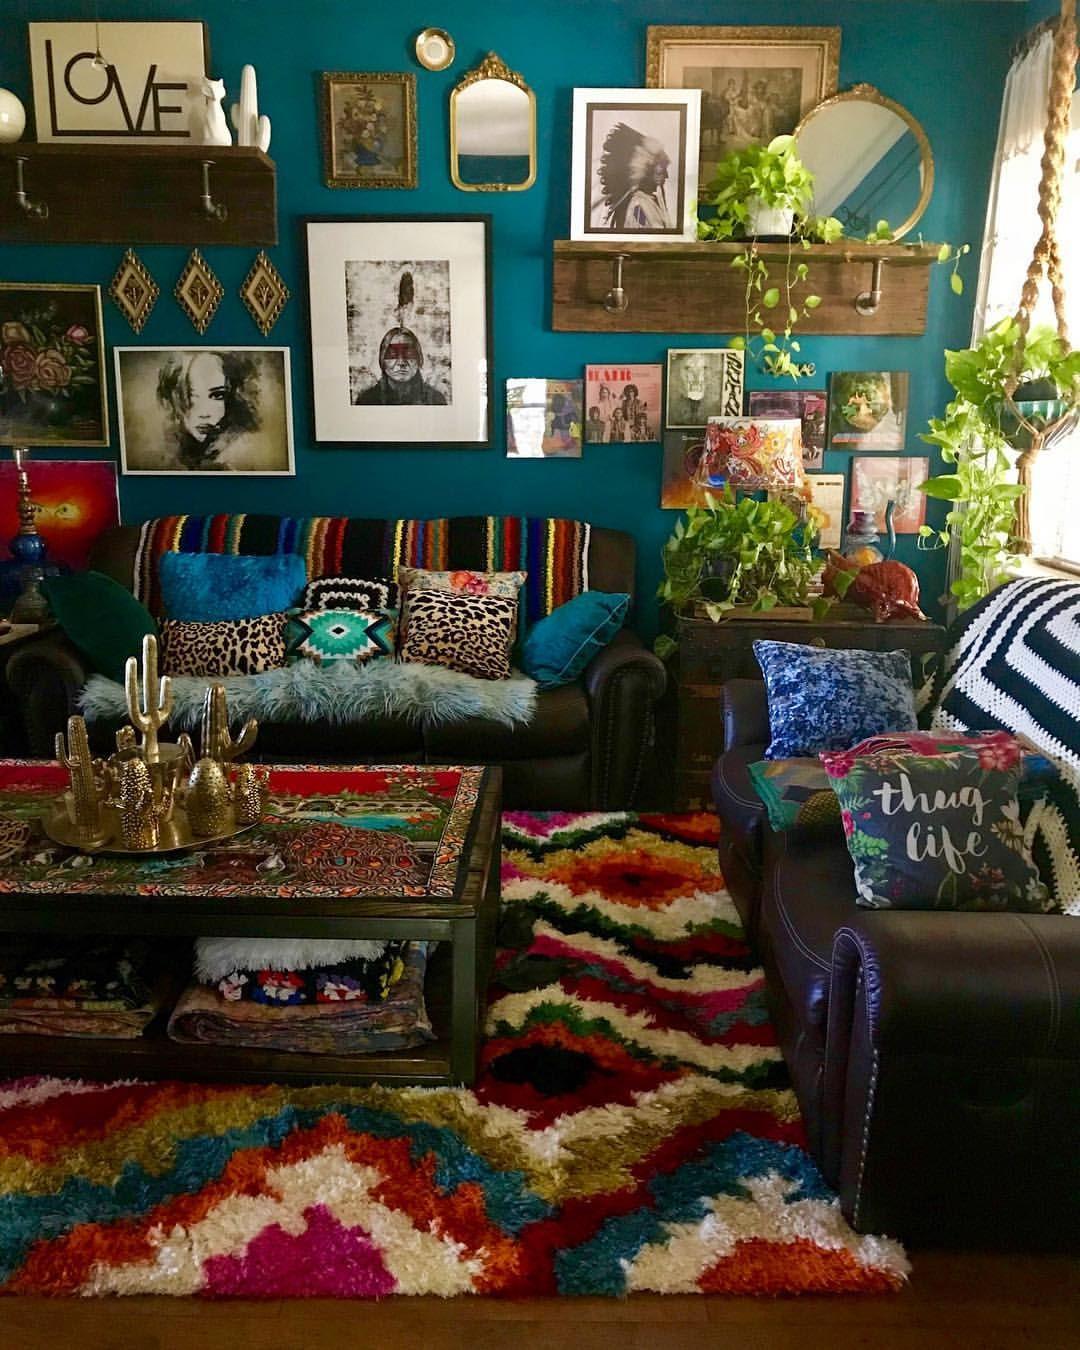 Instagram Post By Interior Design Home Decor Inspire: Instagram Post By Lori Danielle • Apr 25, 2018 At 8:35pm